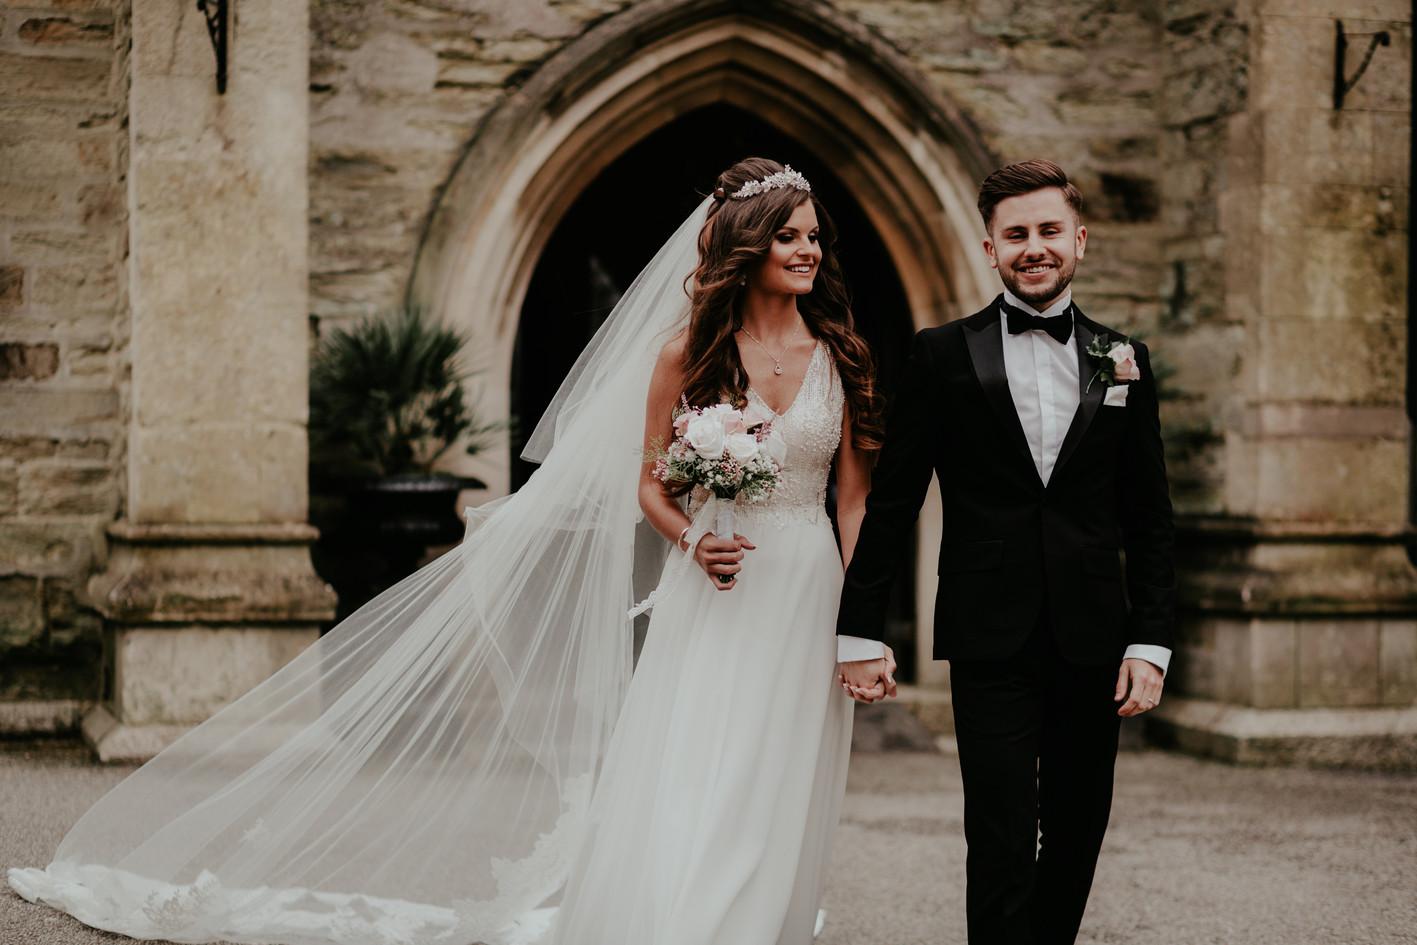 wedding-photography-cornwall-7.jpg